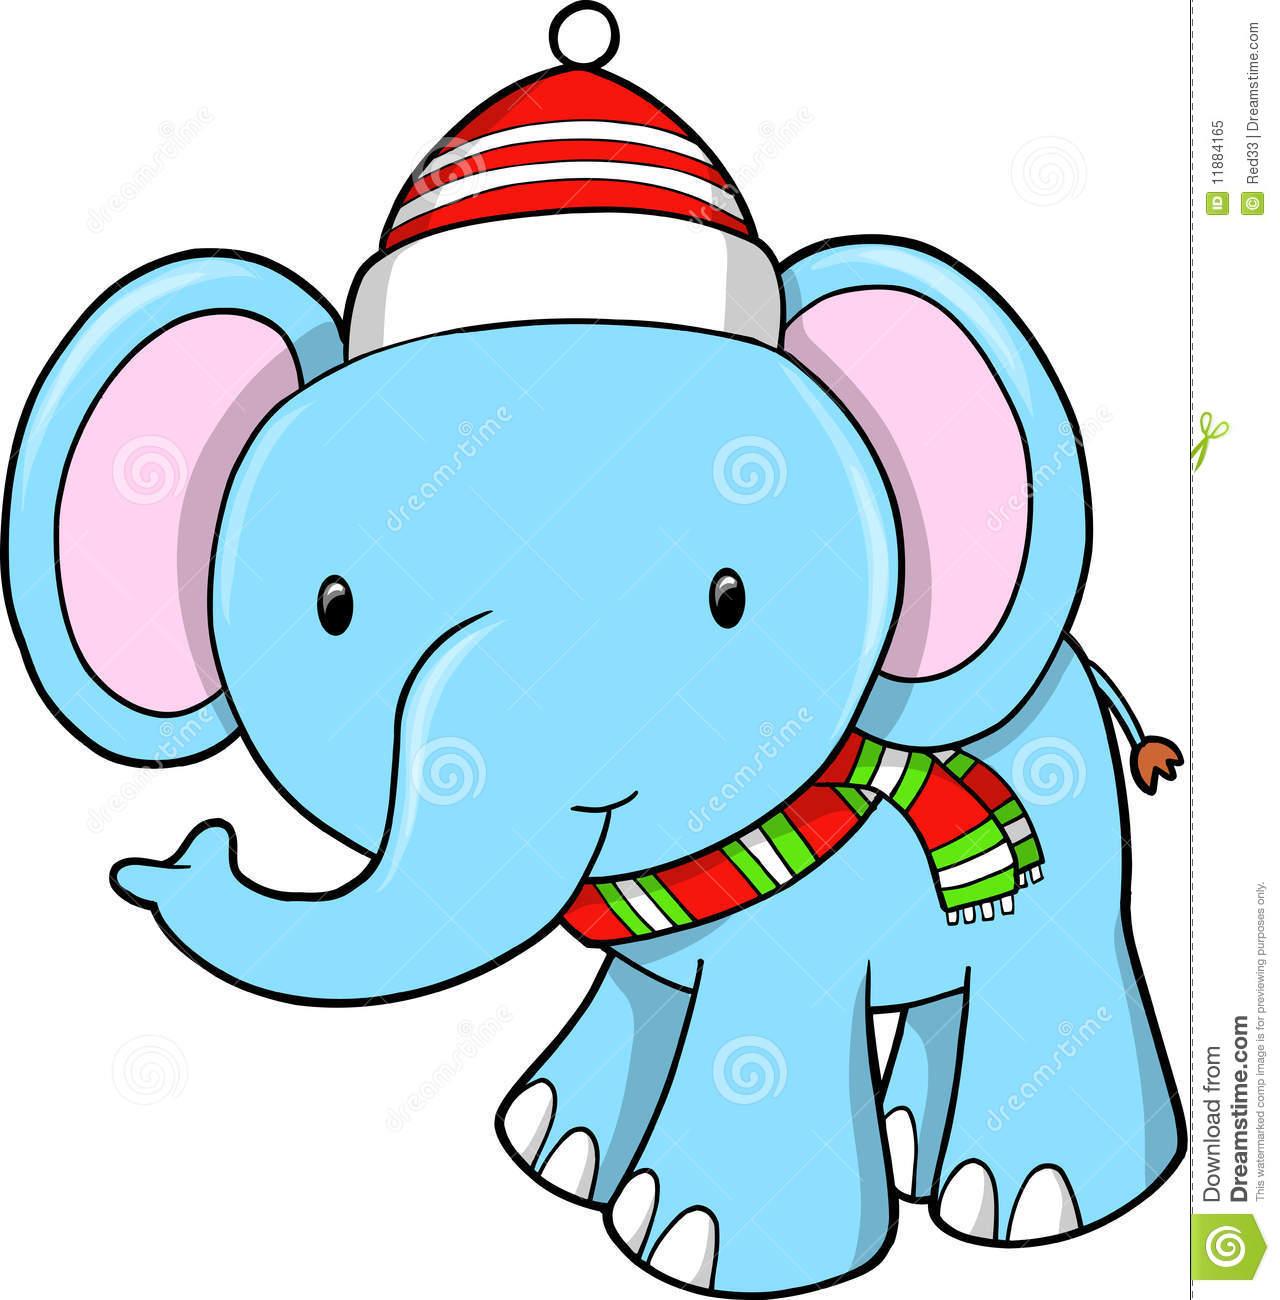 1280x1300 Christmas Elephant Vector Stock Image Of Themes 11613071 Clip Art